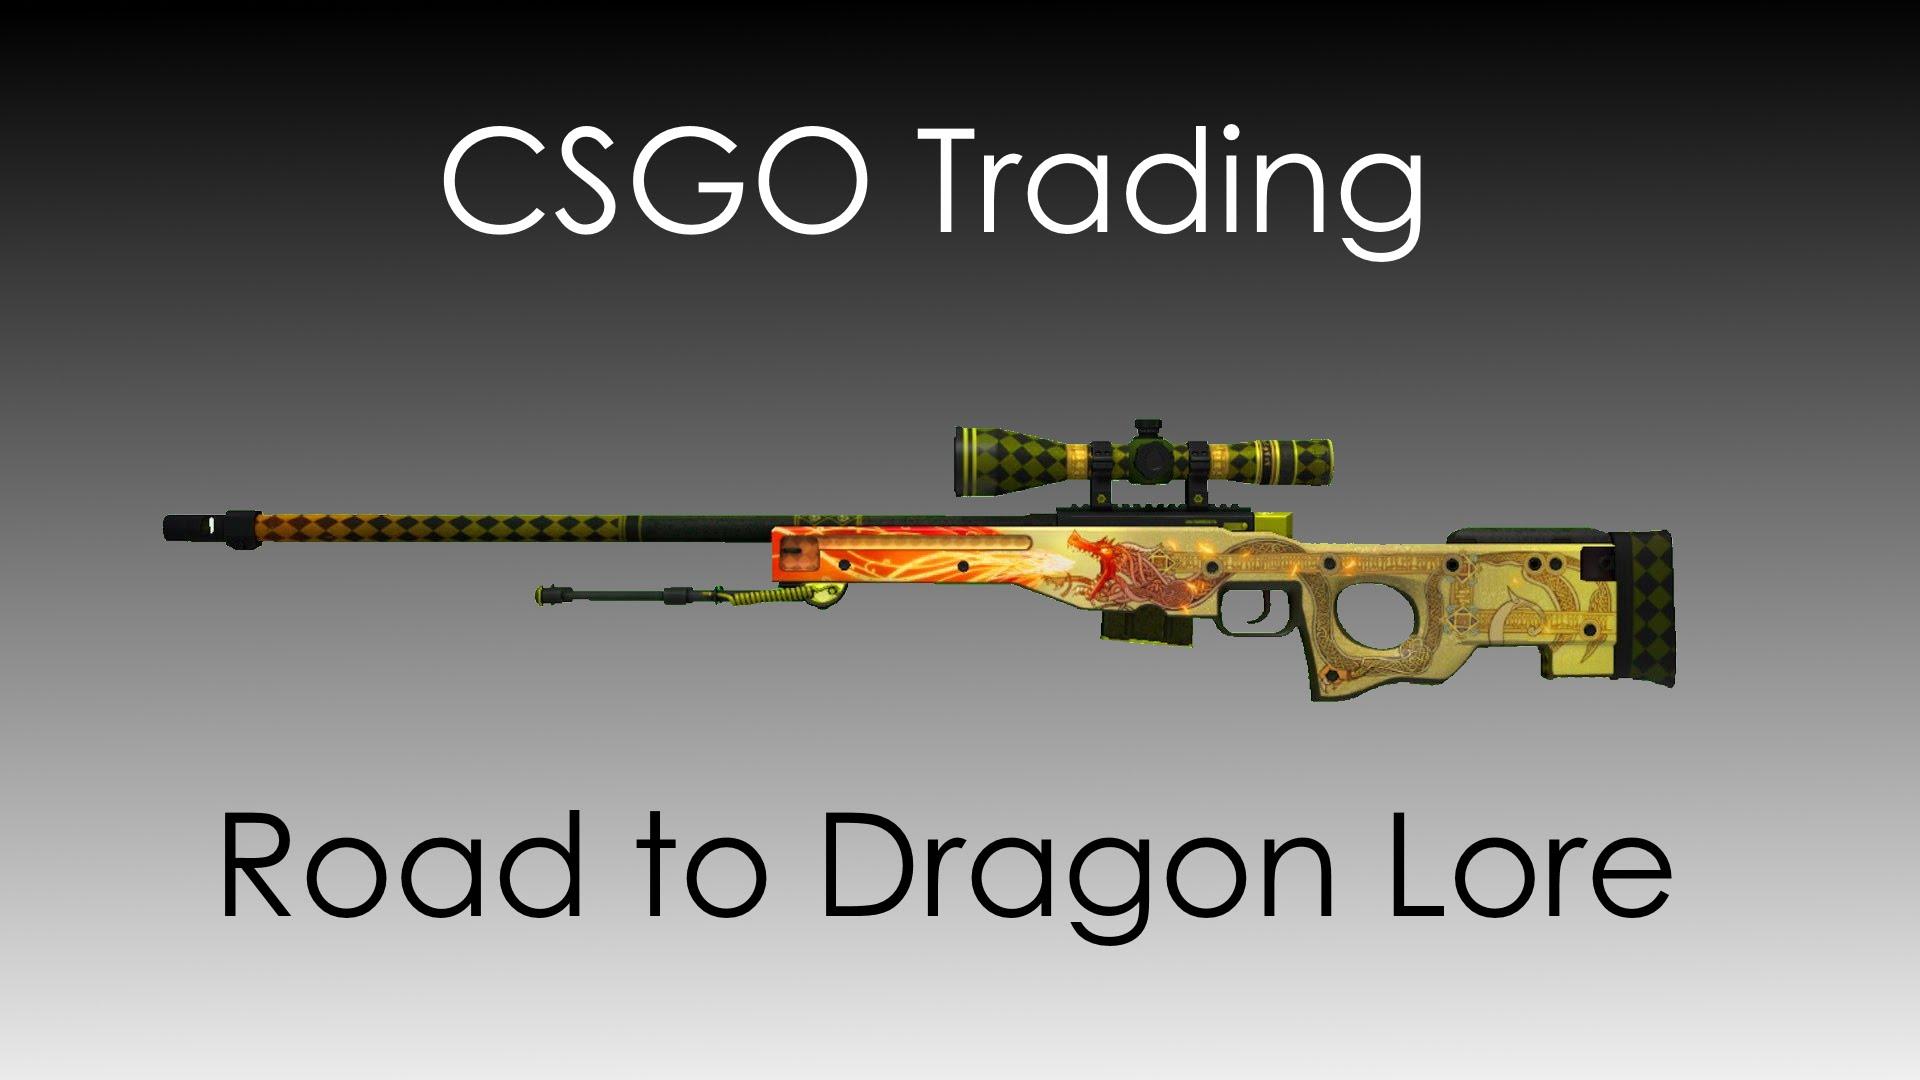 Csgo Trading Gun - Dragon Lol Cs Go - HD Wallpaper